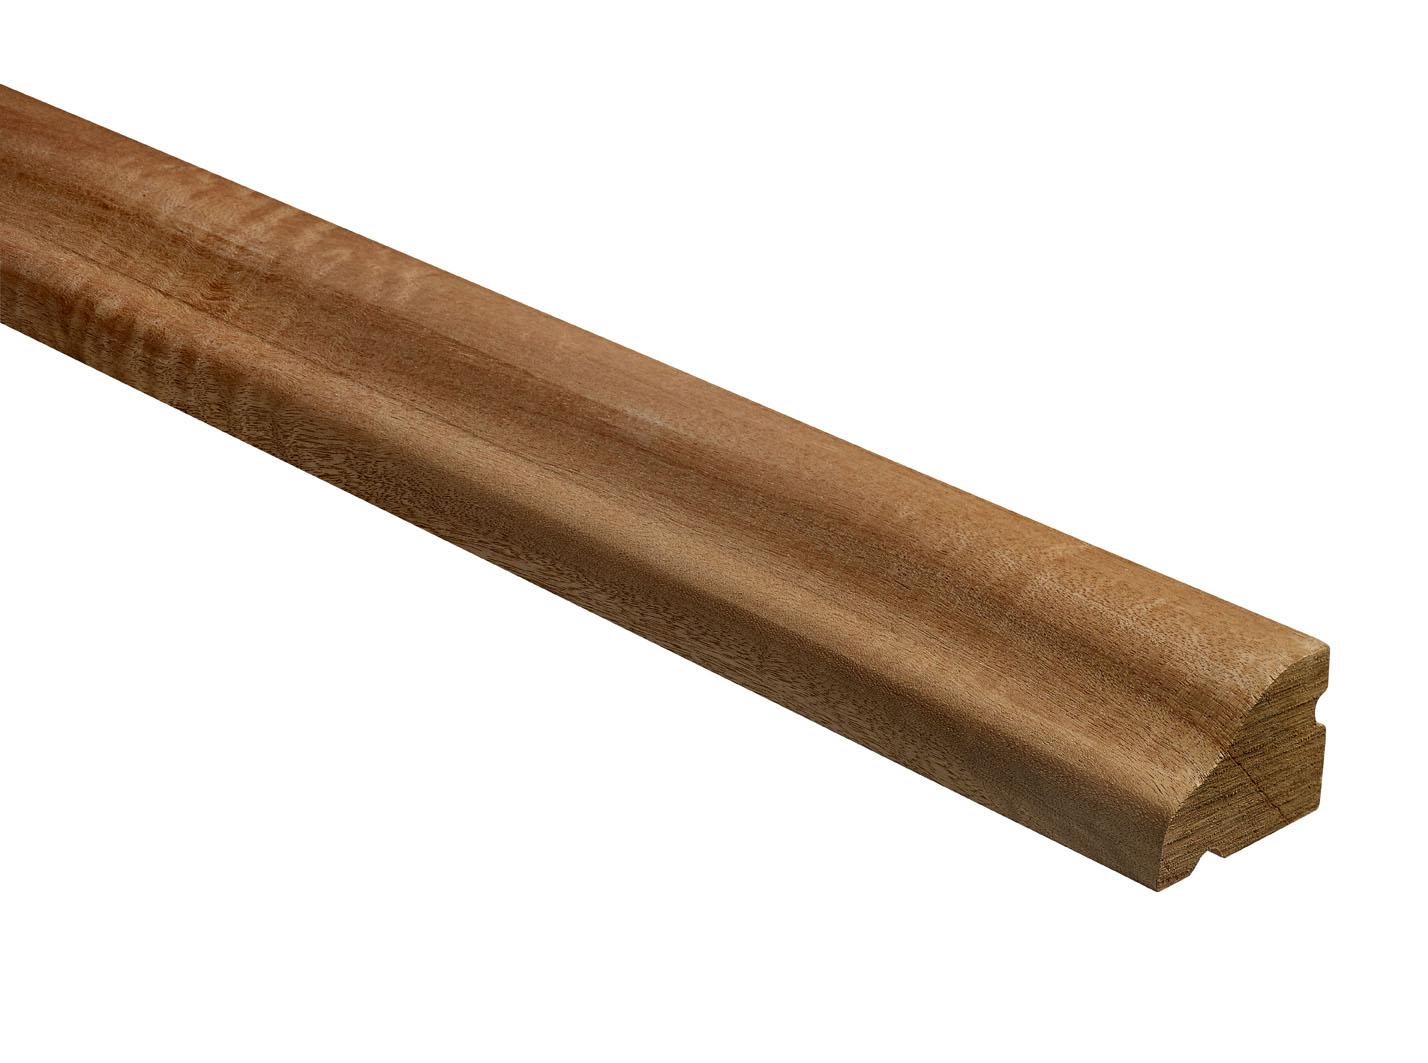 10 Dark Hardwood Weather Bar Mouldings 34 x 58 x 900mm